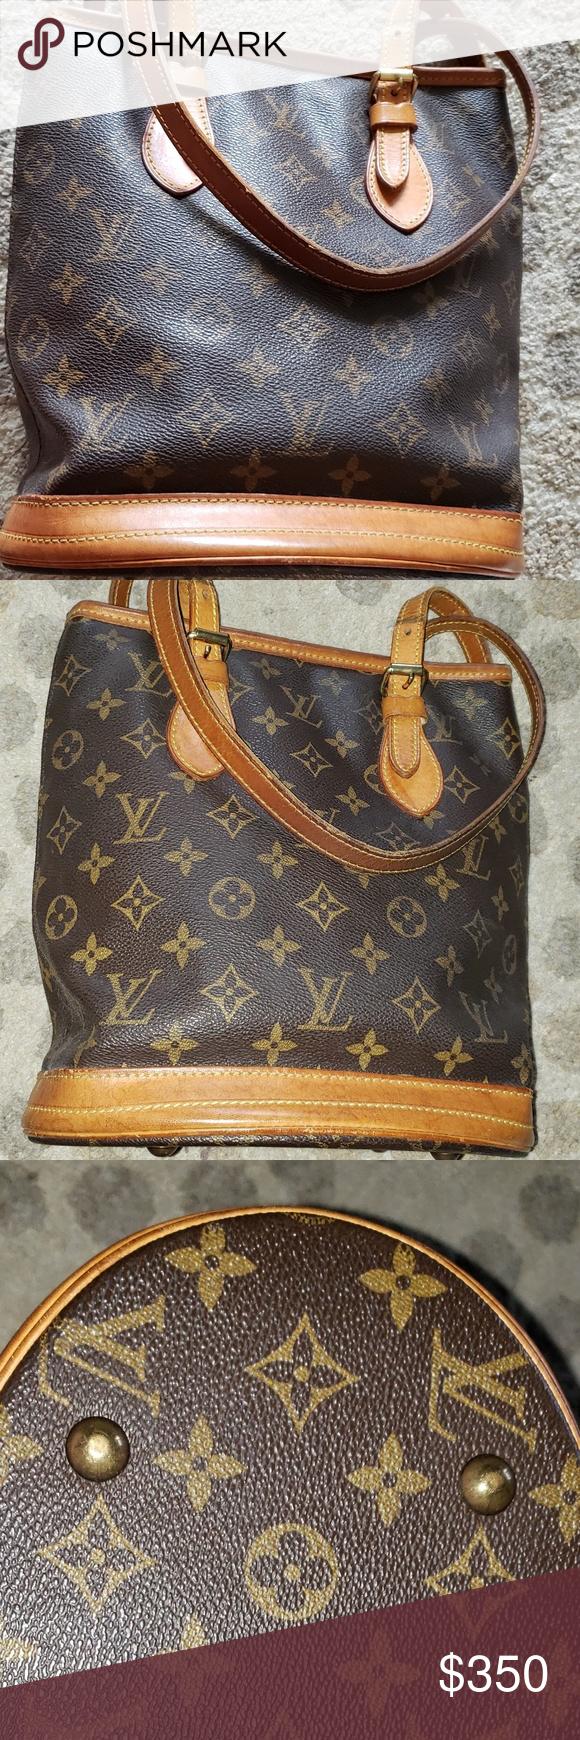 Louis Vuitton Bucket Bag Authentic Louis Vuitton bucket ...